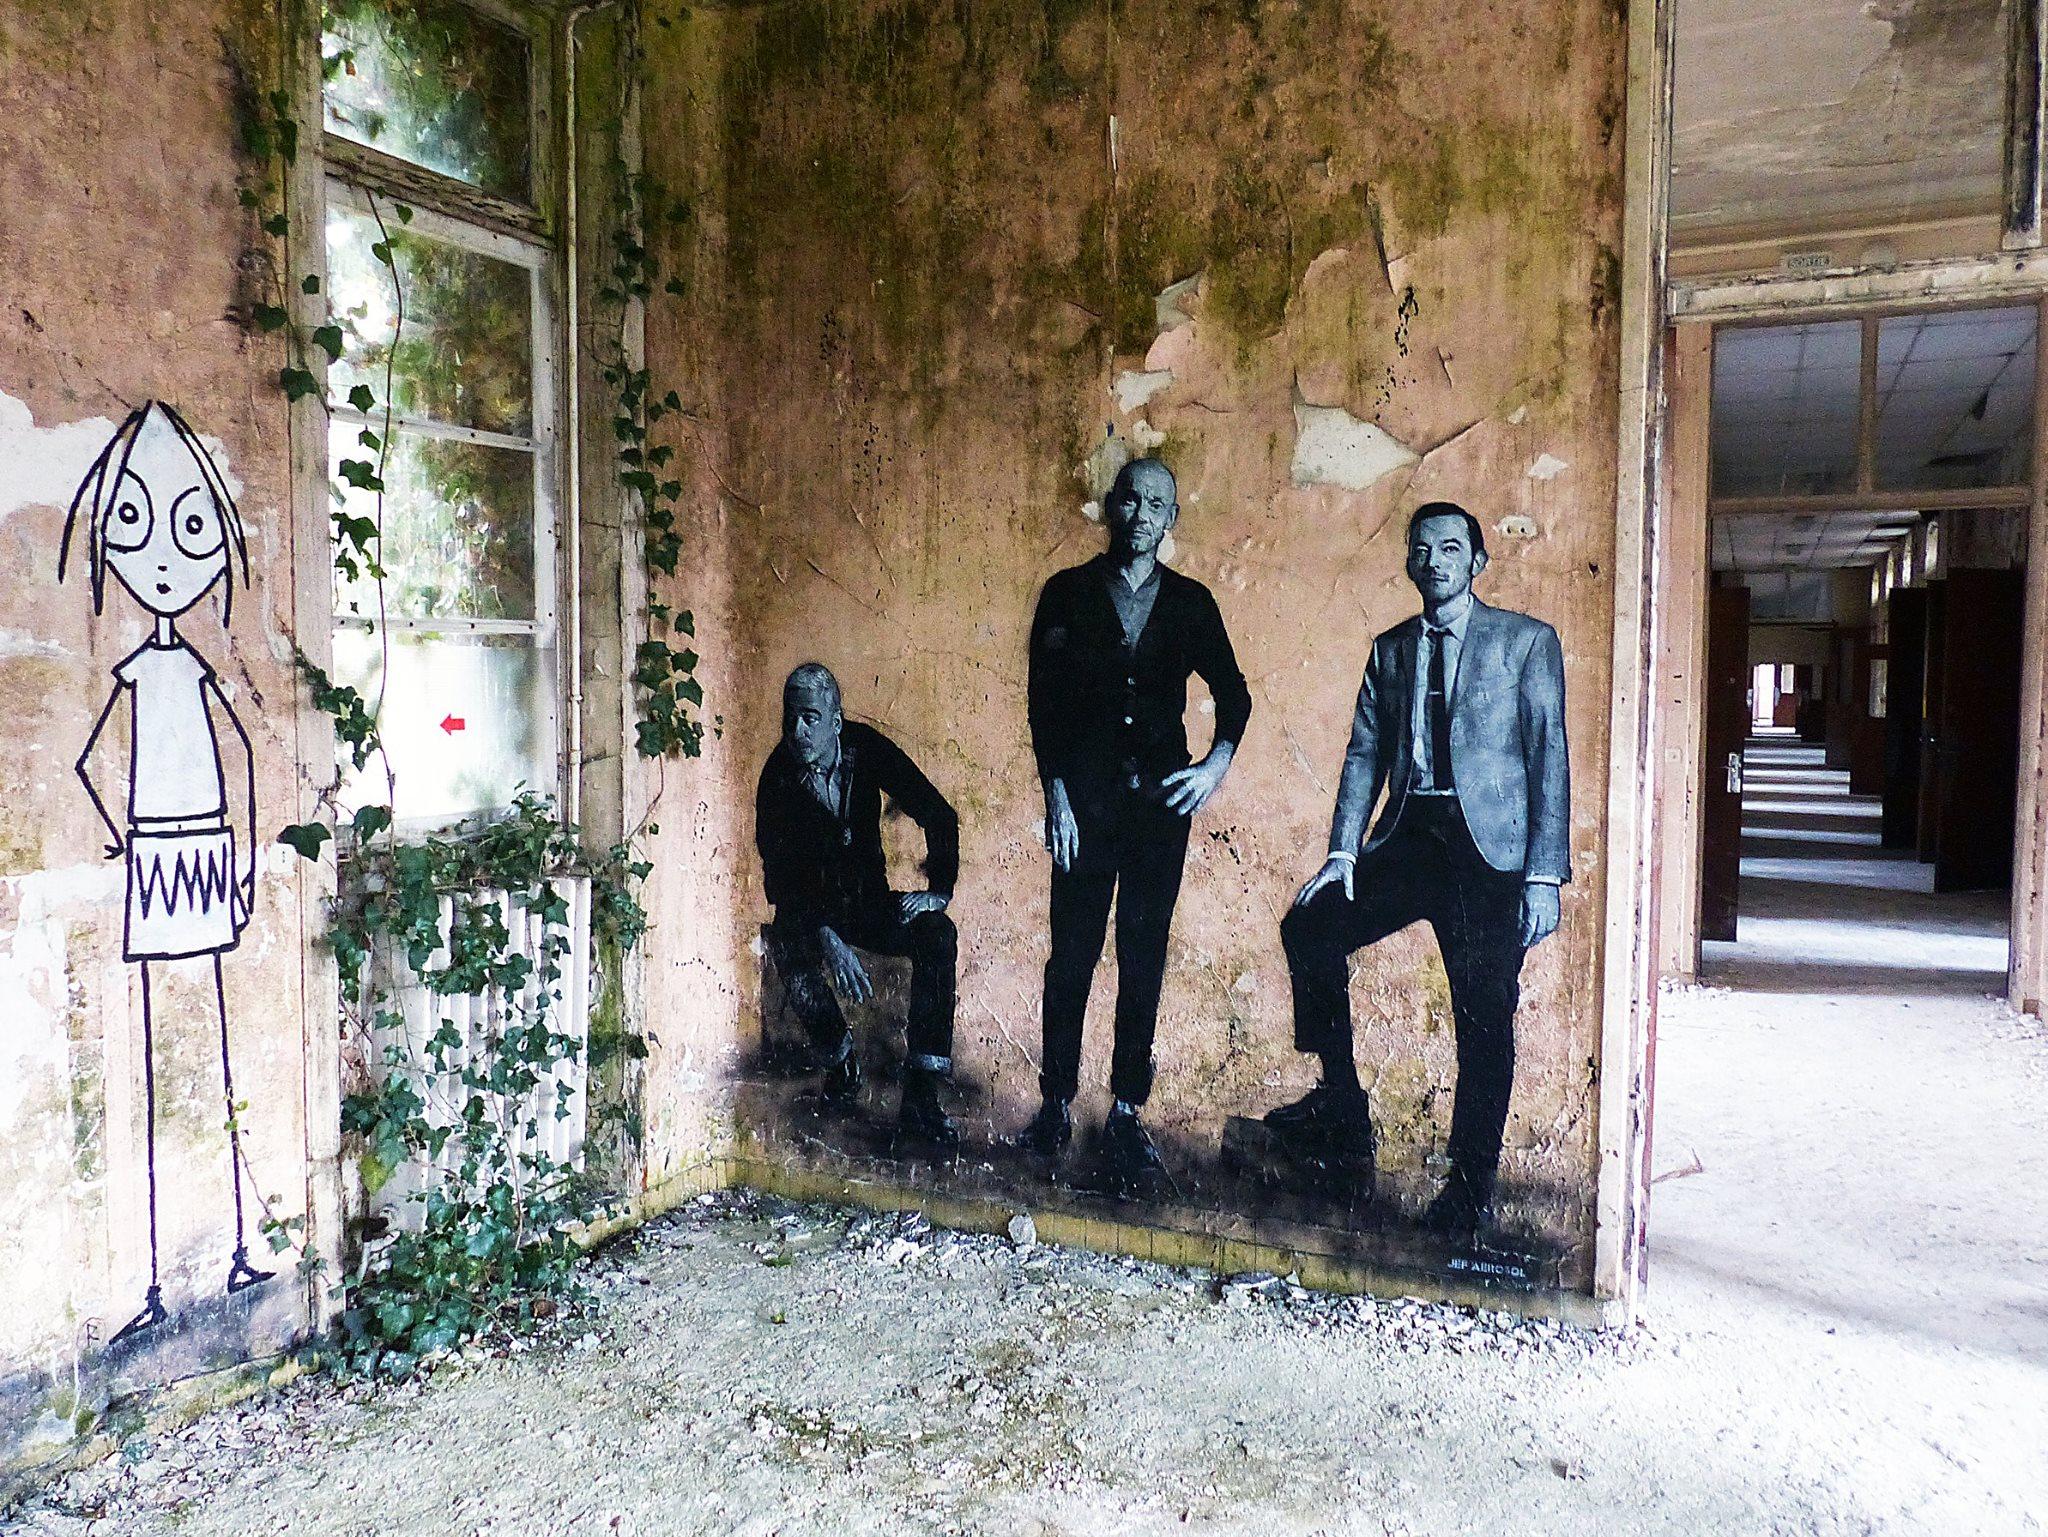 Esténciles de los integrantes del grupo de rock francés Louise Attaque. Grands Moulins de París. Marquette-Les-Lille. 11 de Marzo de 2016. Foto: Alexis Christiaen.